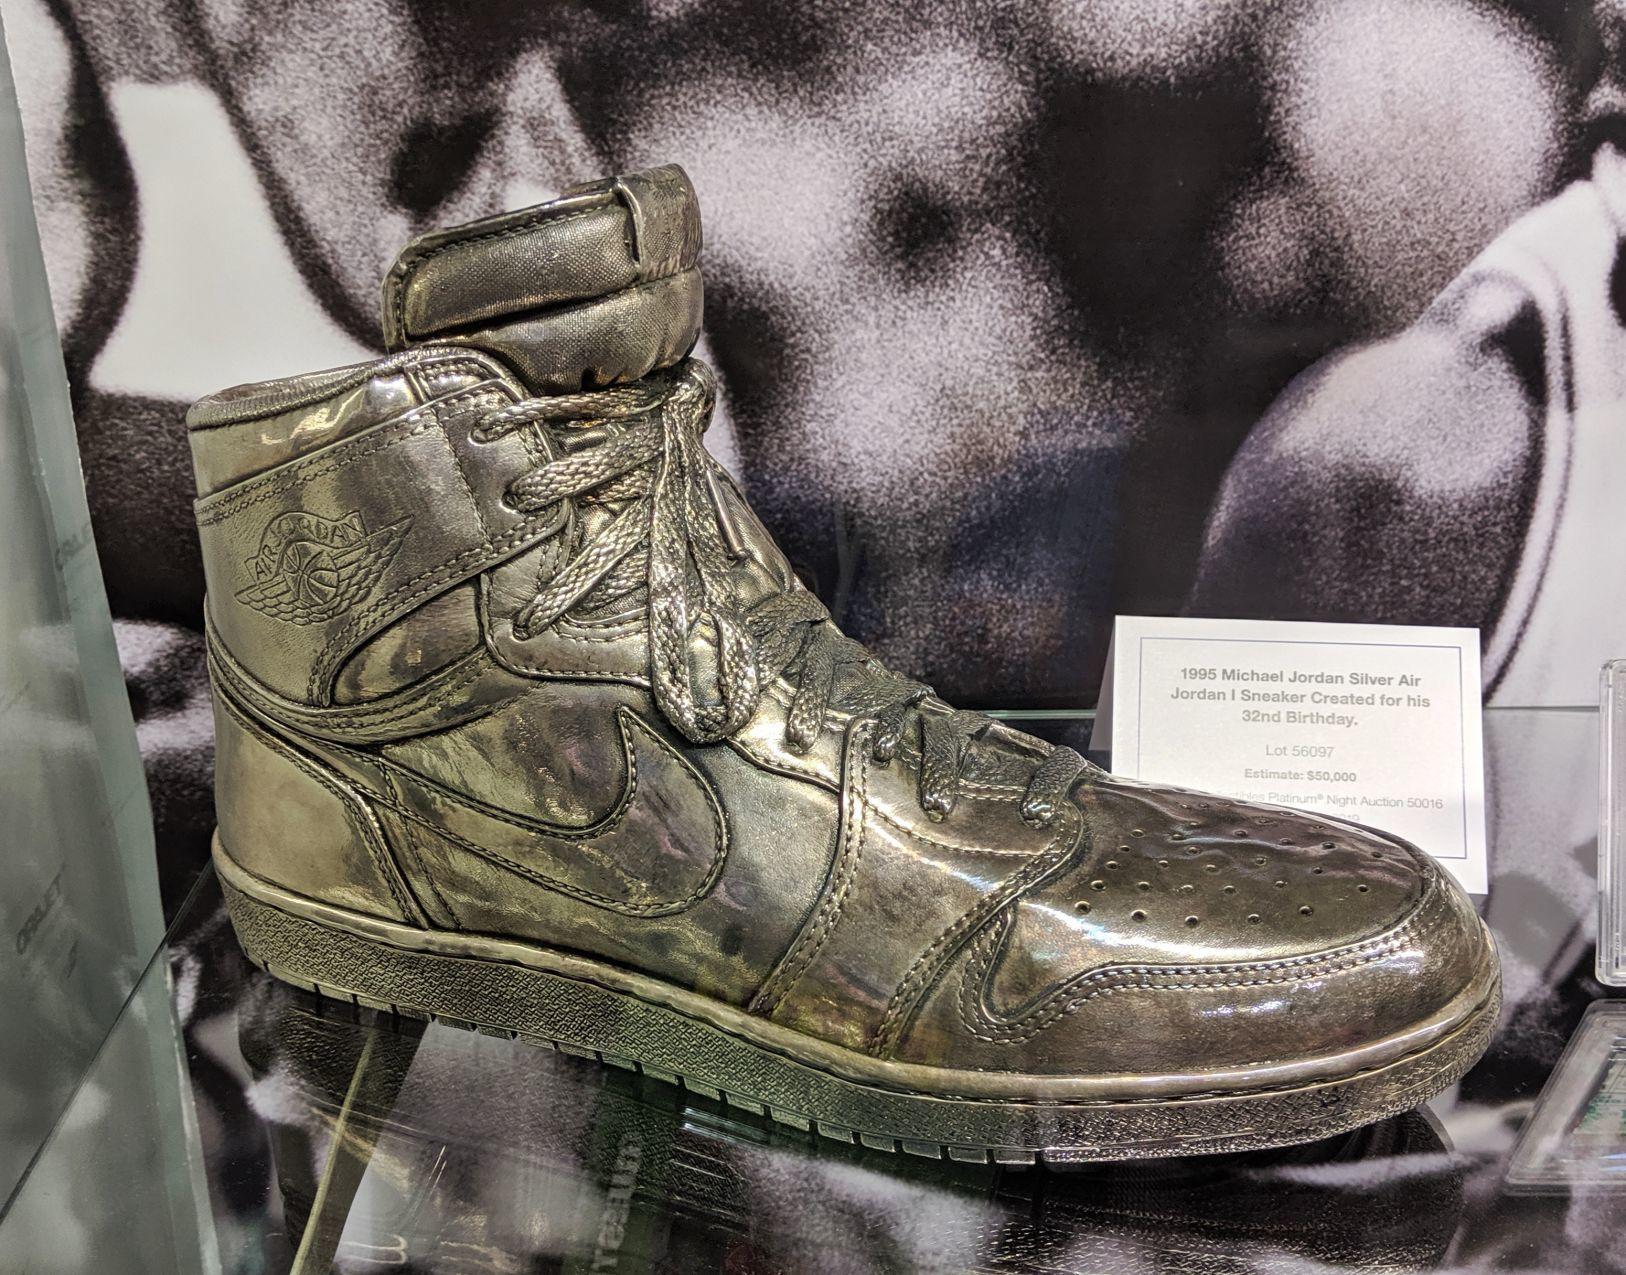 Michael Jordan Silver Shoe     herald